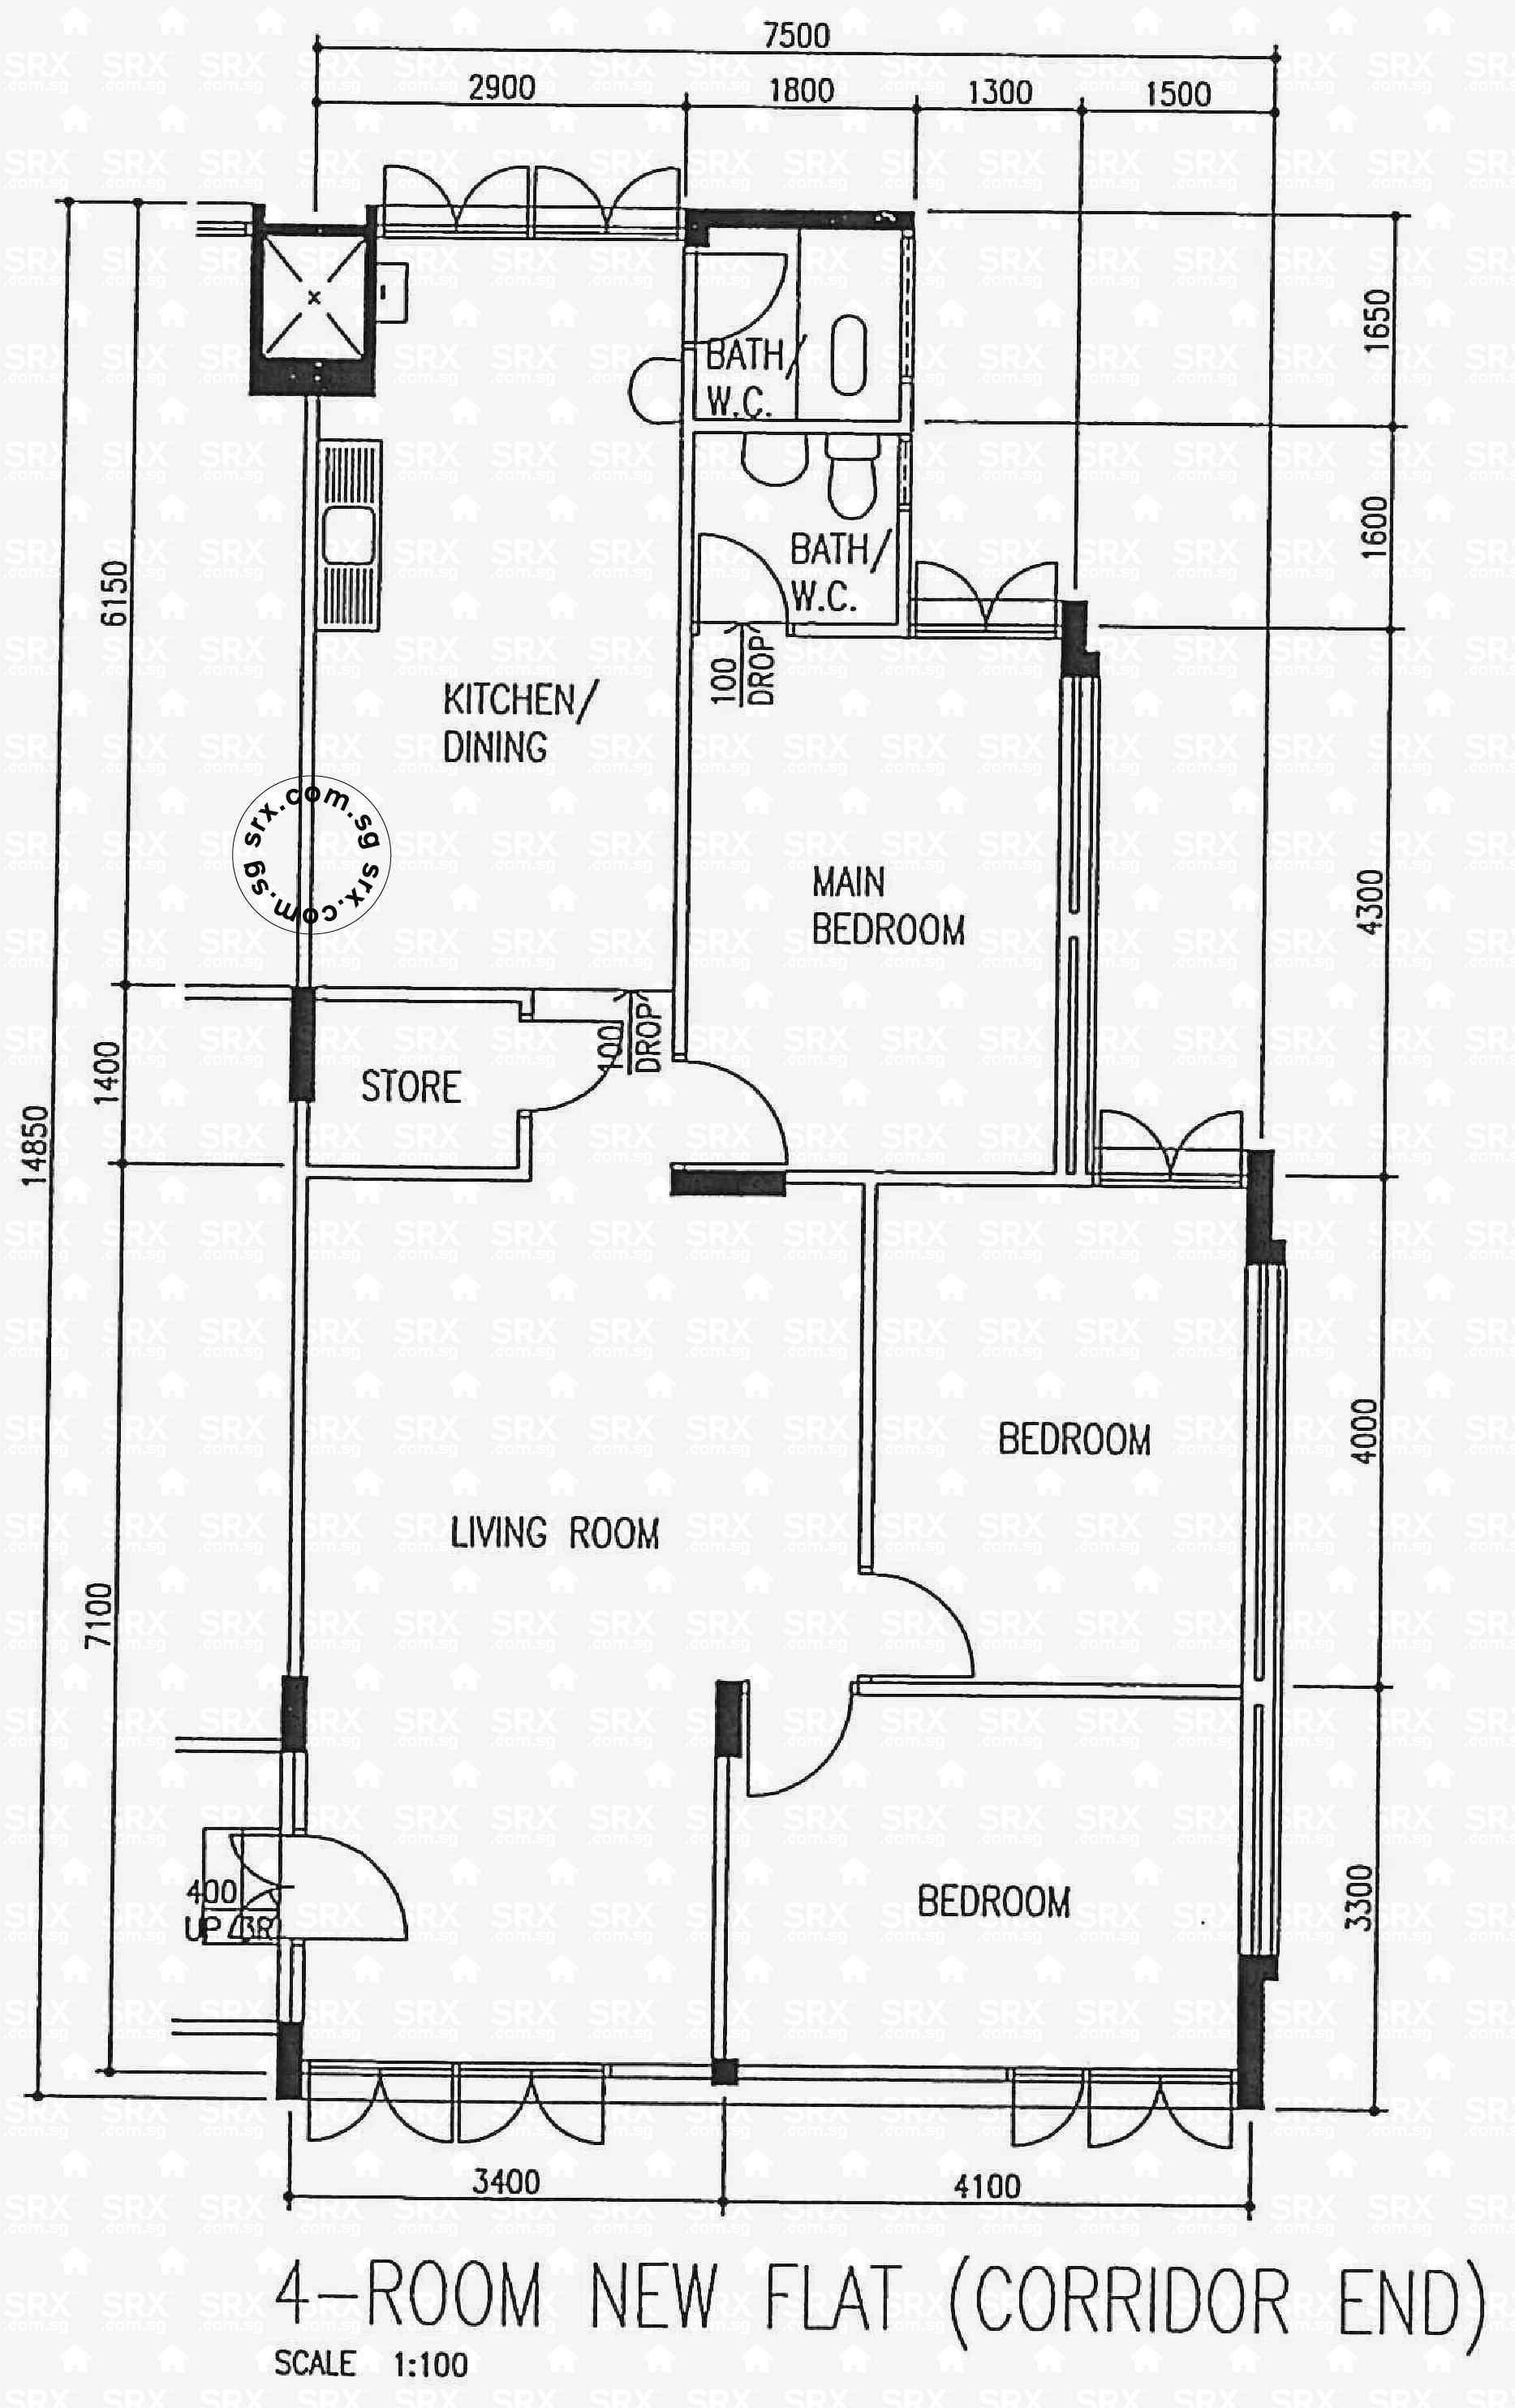 Floor Plans for 710 Clementi West Street 2 (S)120710 HDB Details ...